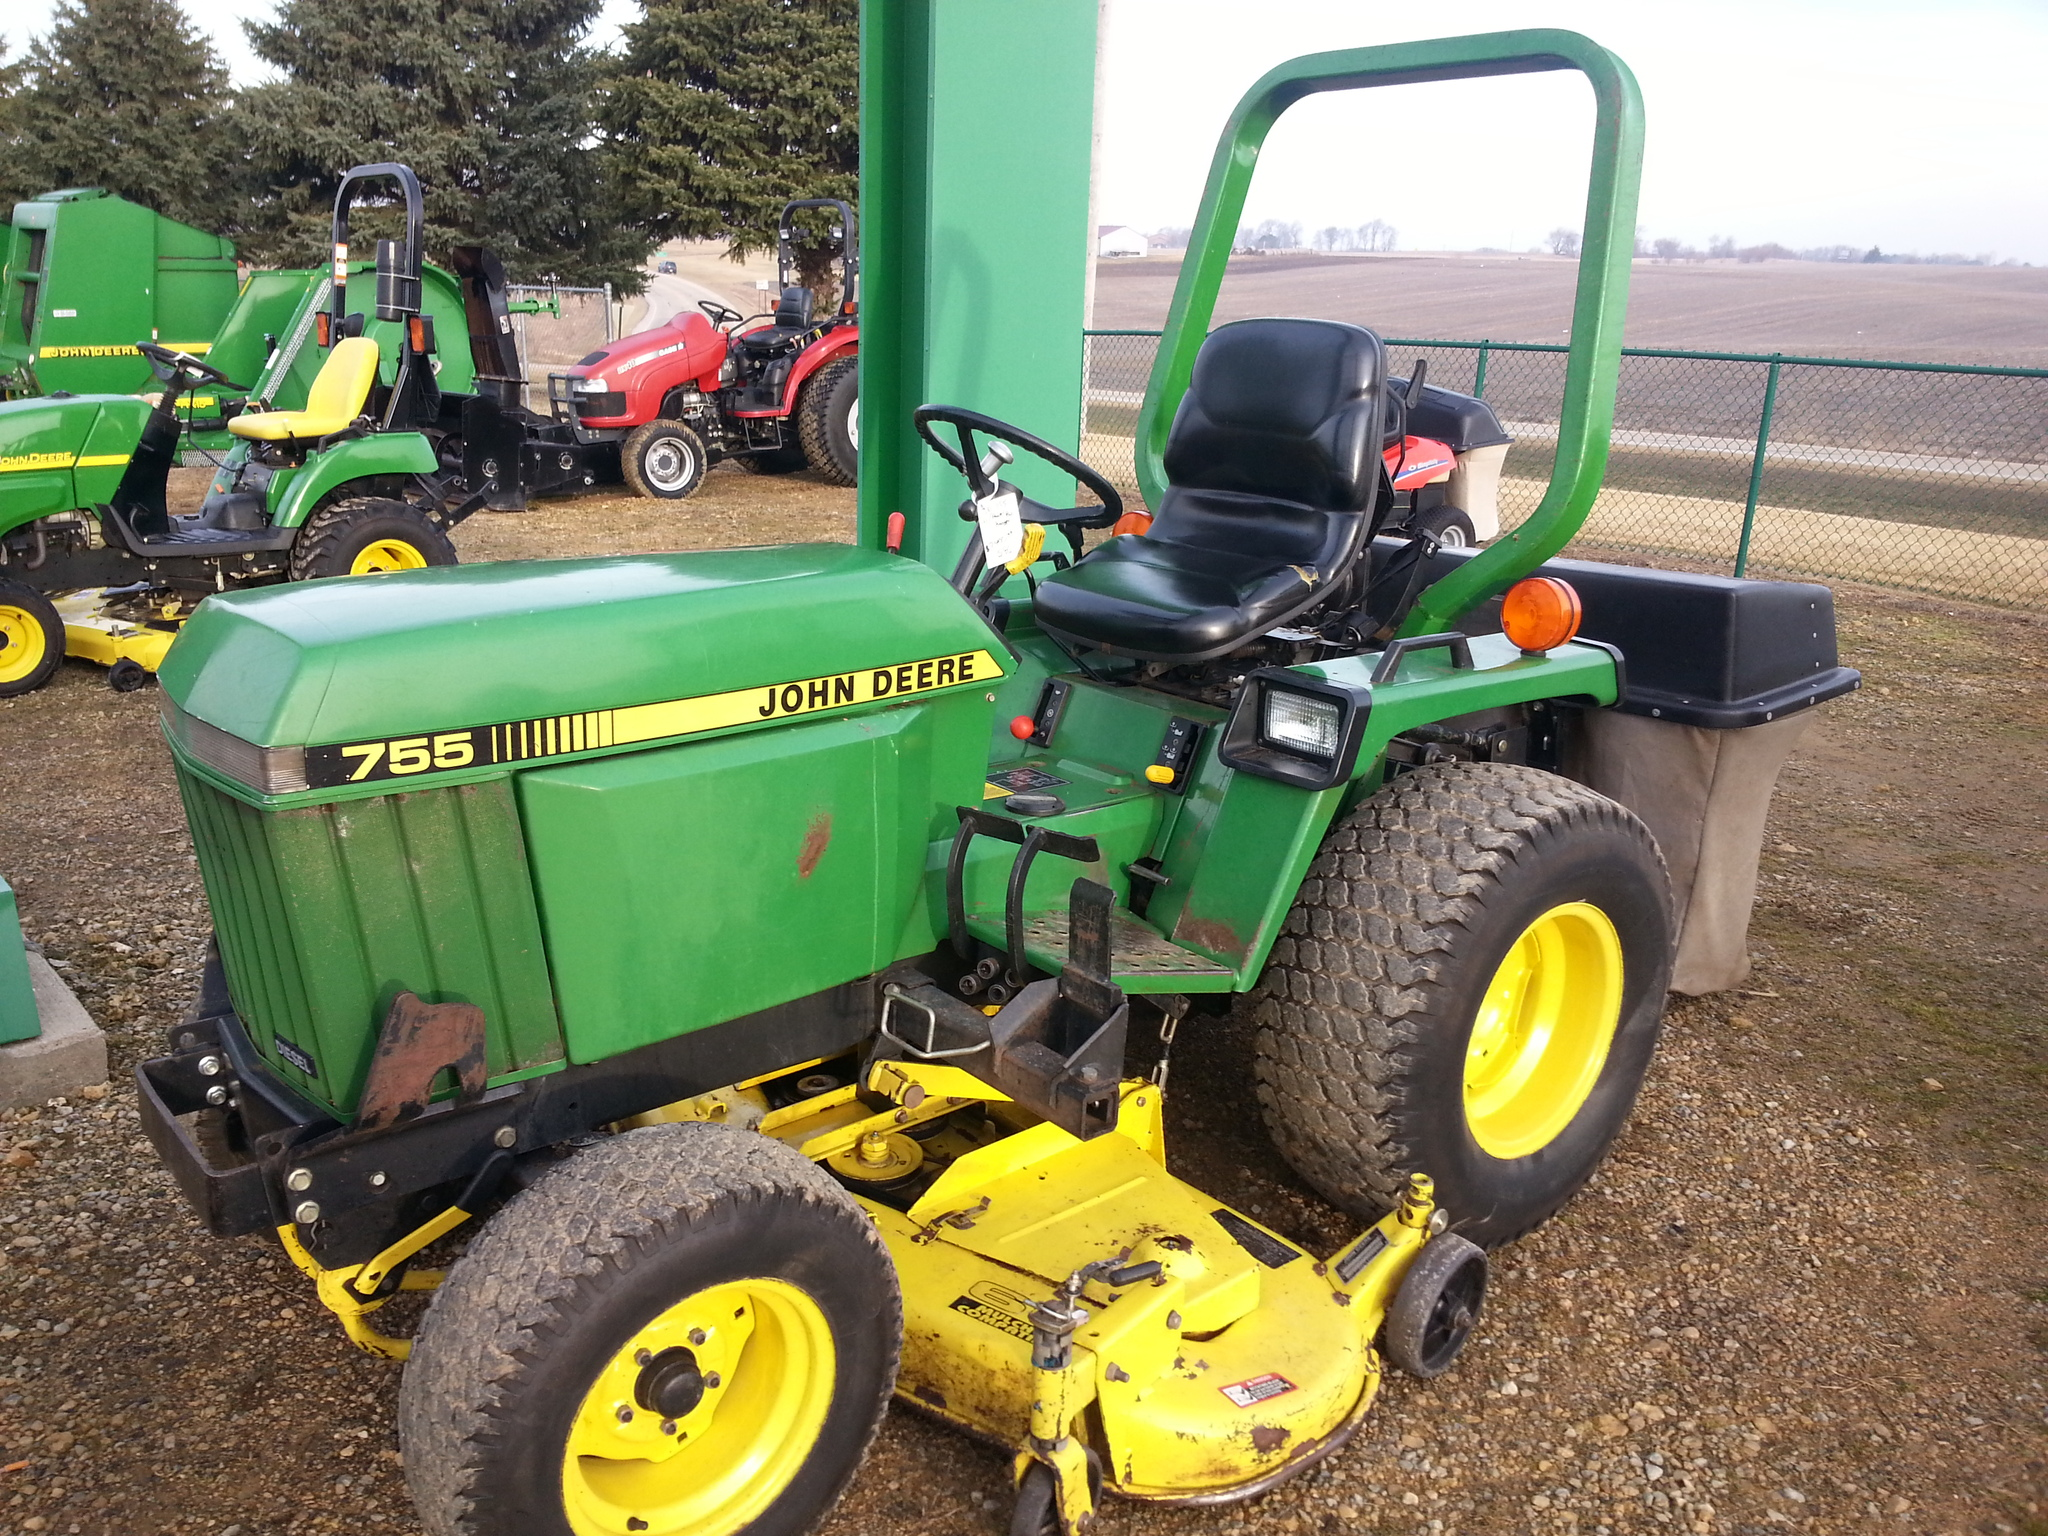 john deere 755 compact utility tractors for sale 56786. Black Bedroom Furniture Sets. Home Design Ideas